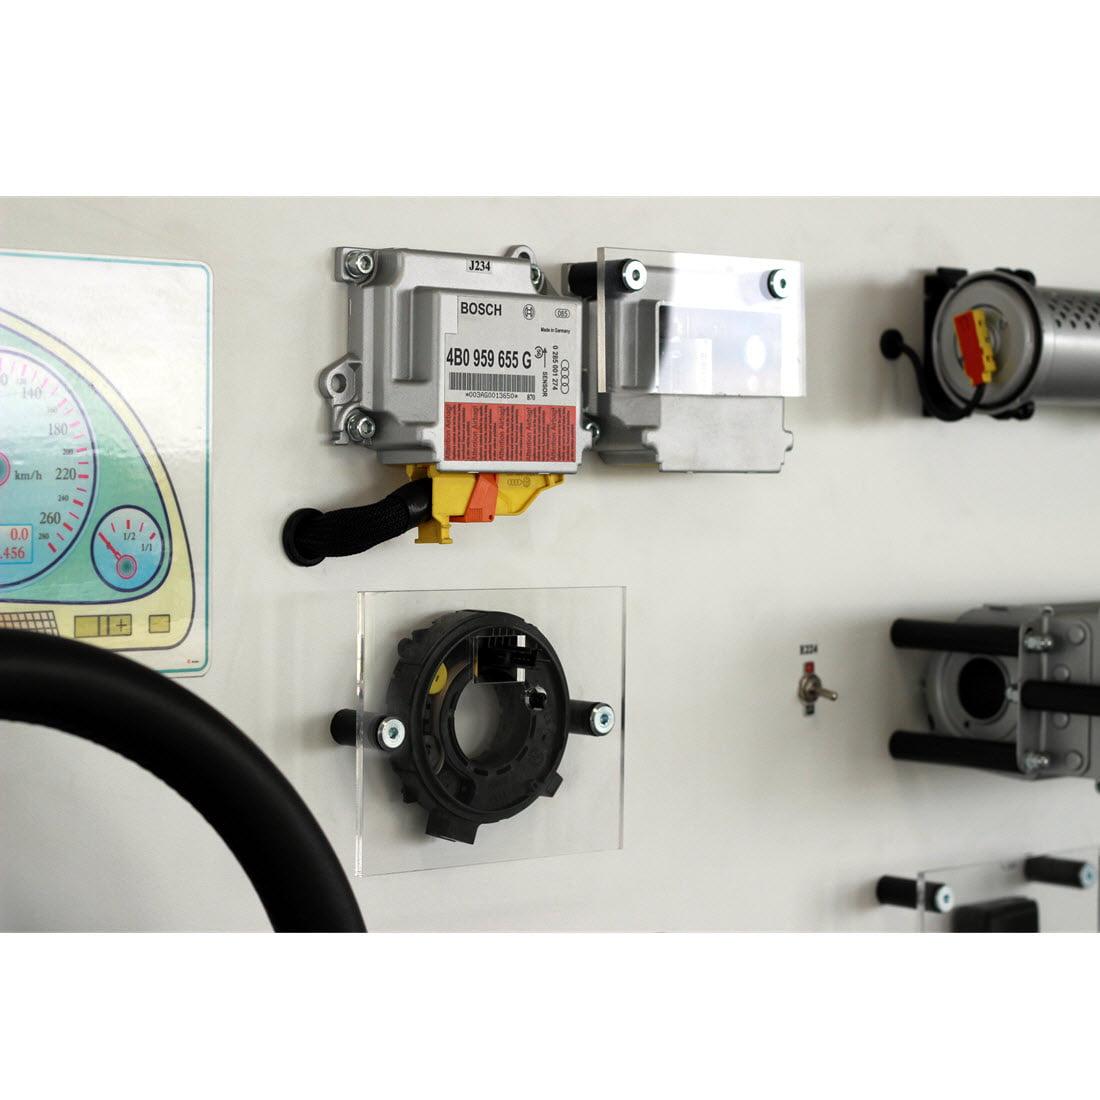 SRS BOSCH AB 8 4 AIRBAG training board-simulator For Sale